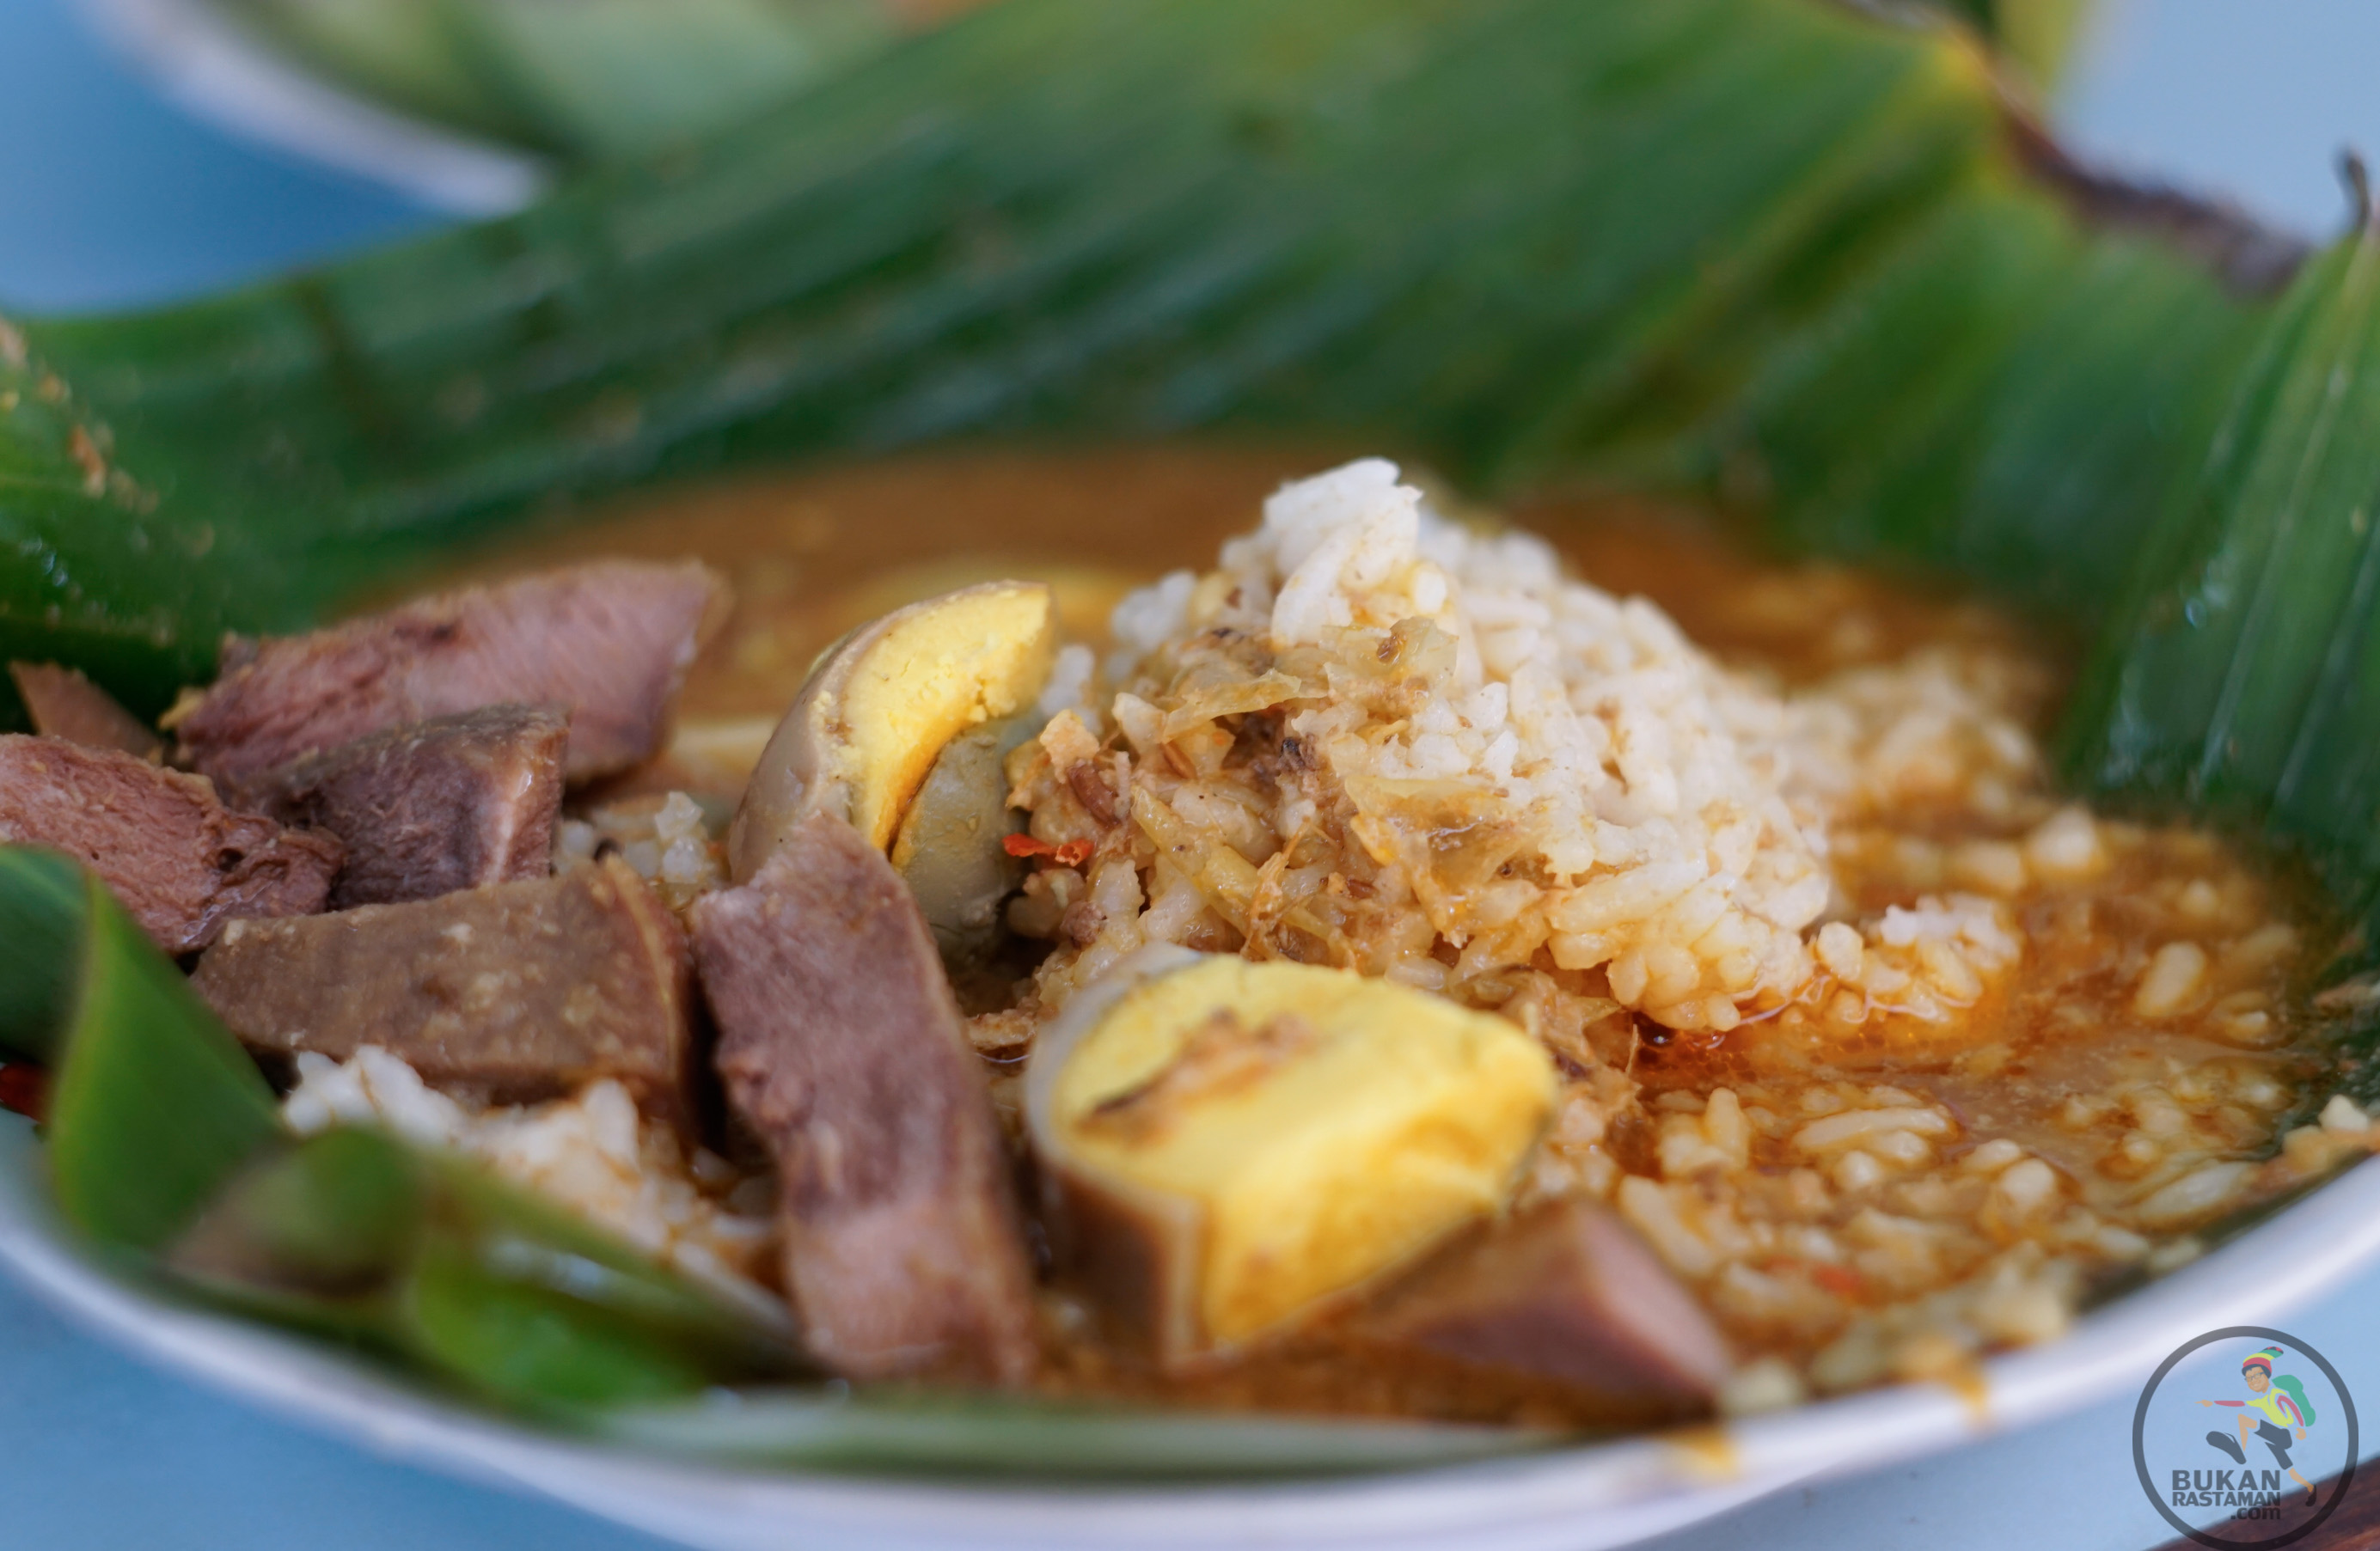 Nikmatnya Nasi Gandul Khas Pati Jawa Tengah Bukanrastaman